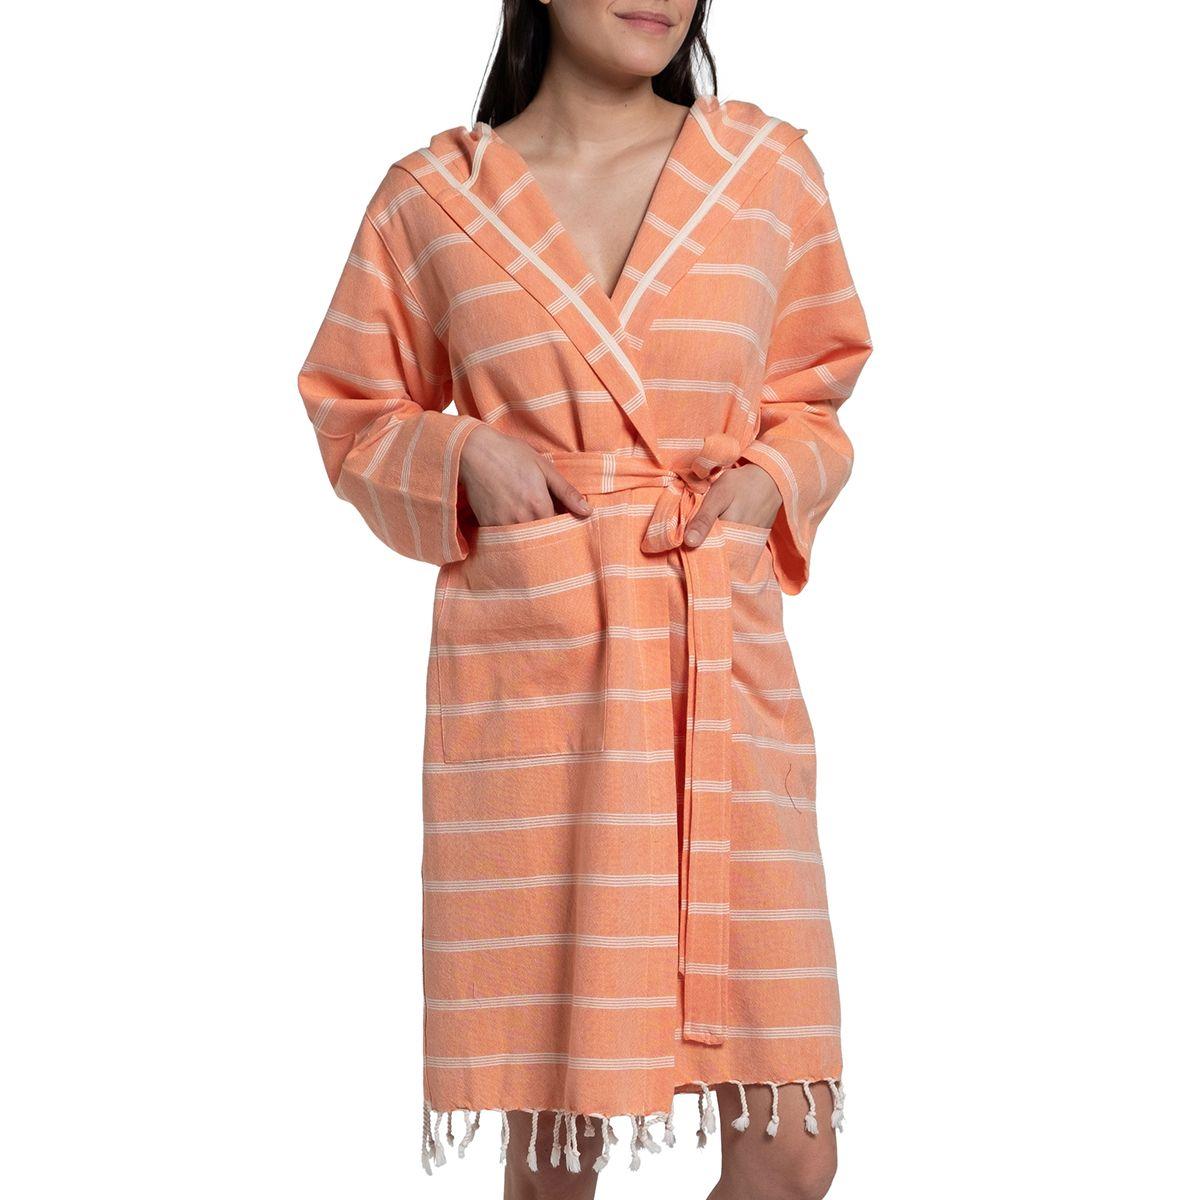 Bathrobe Kokosh - Orange